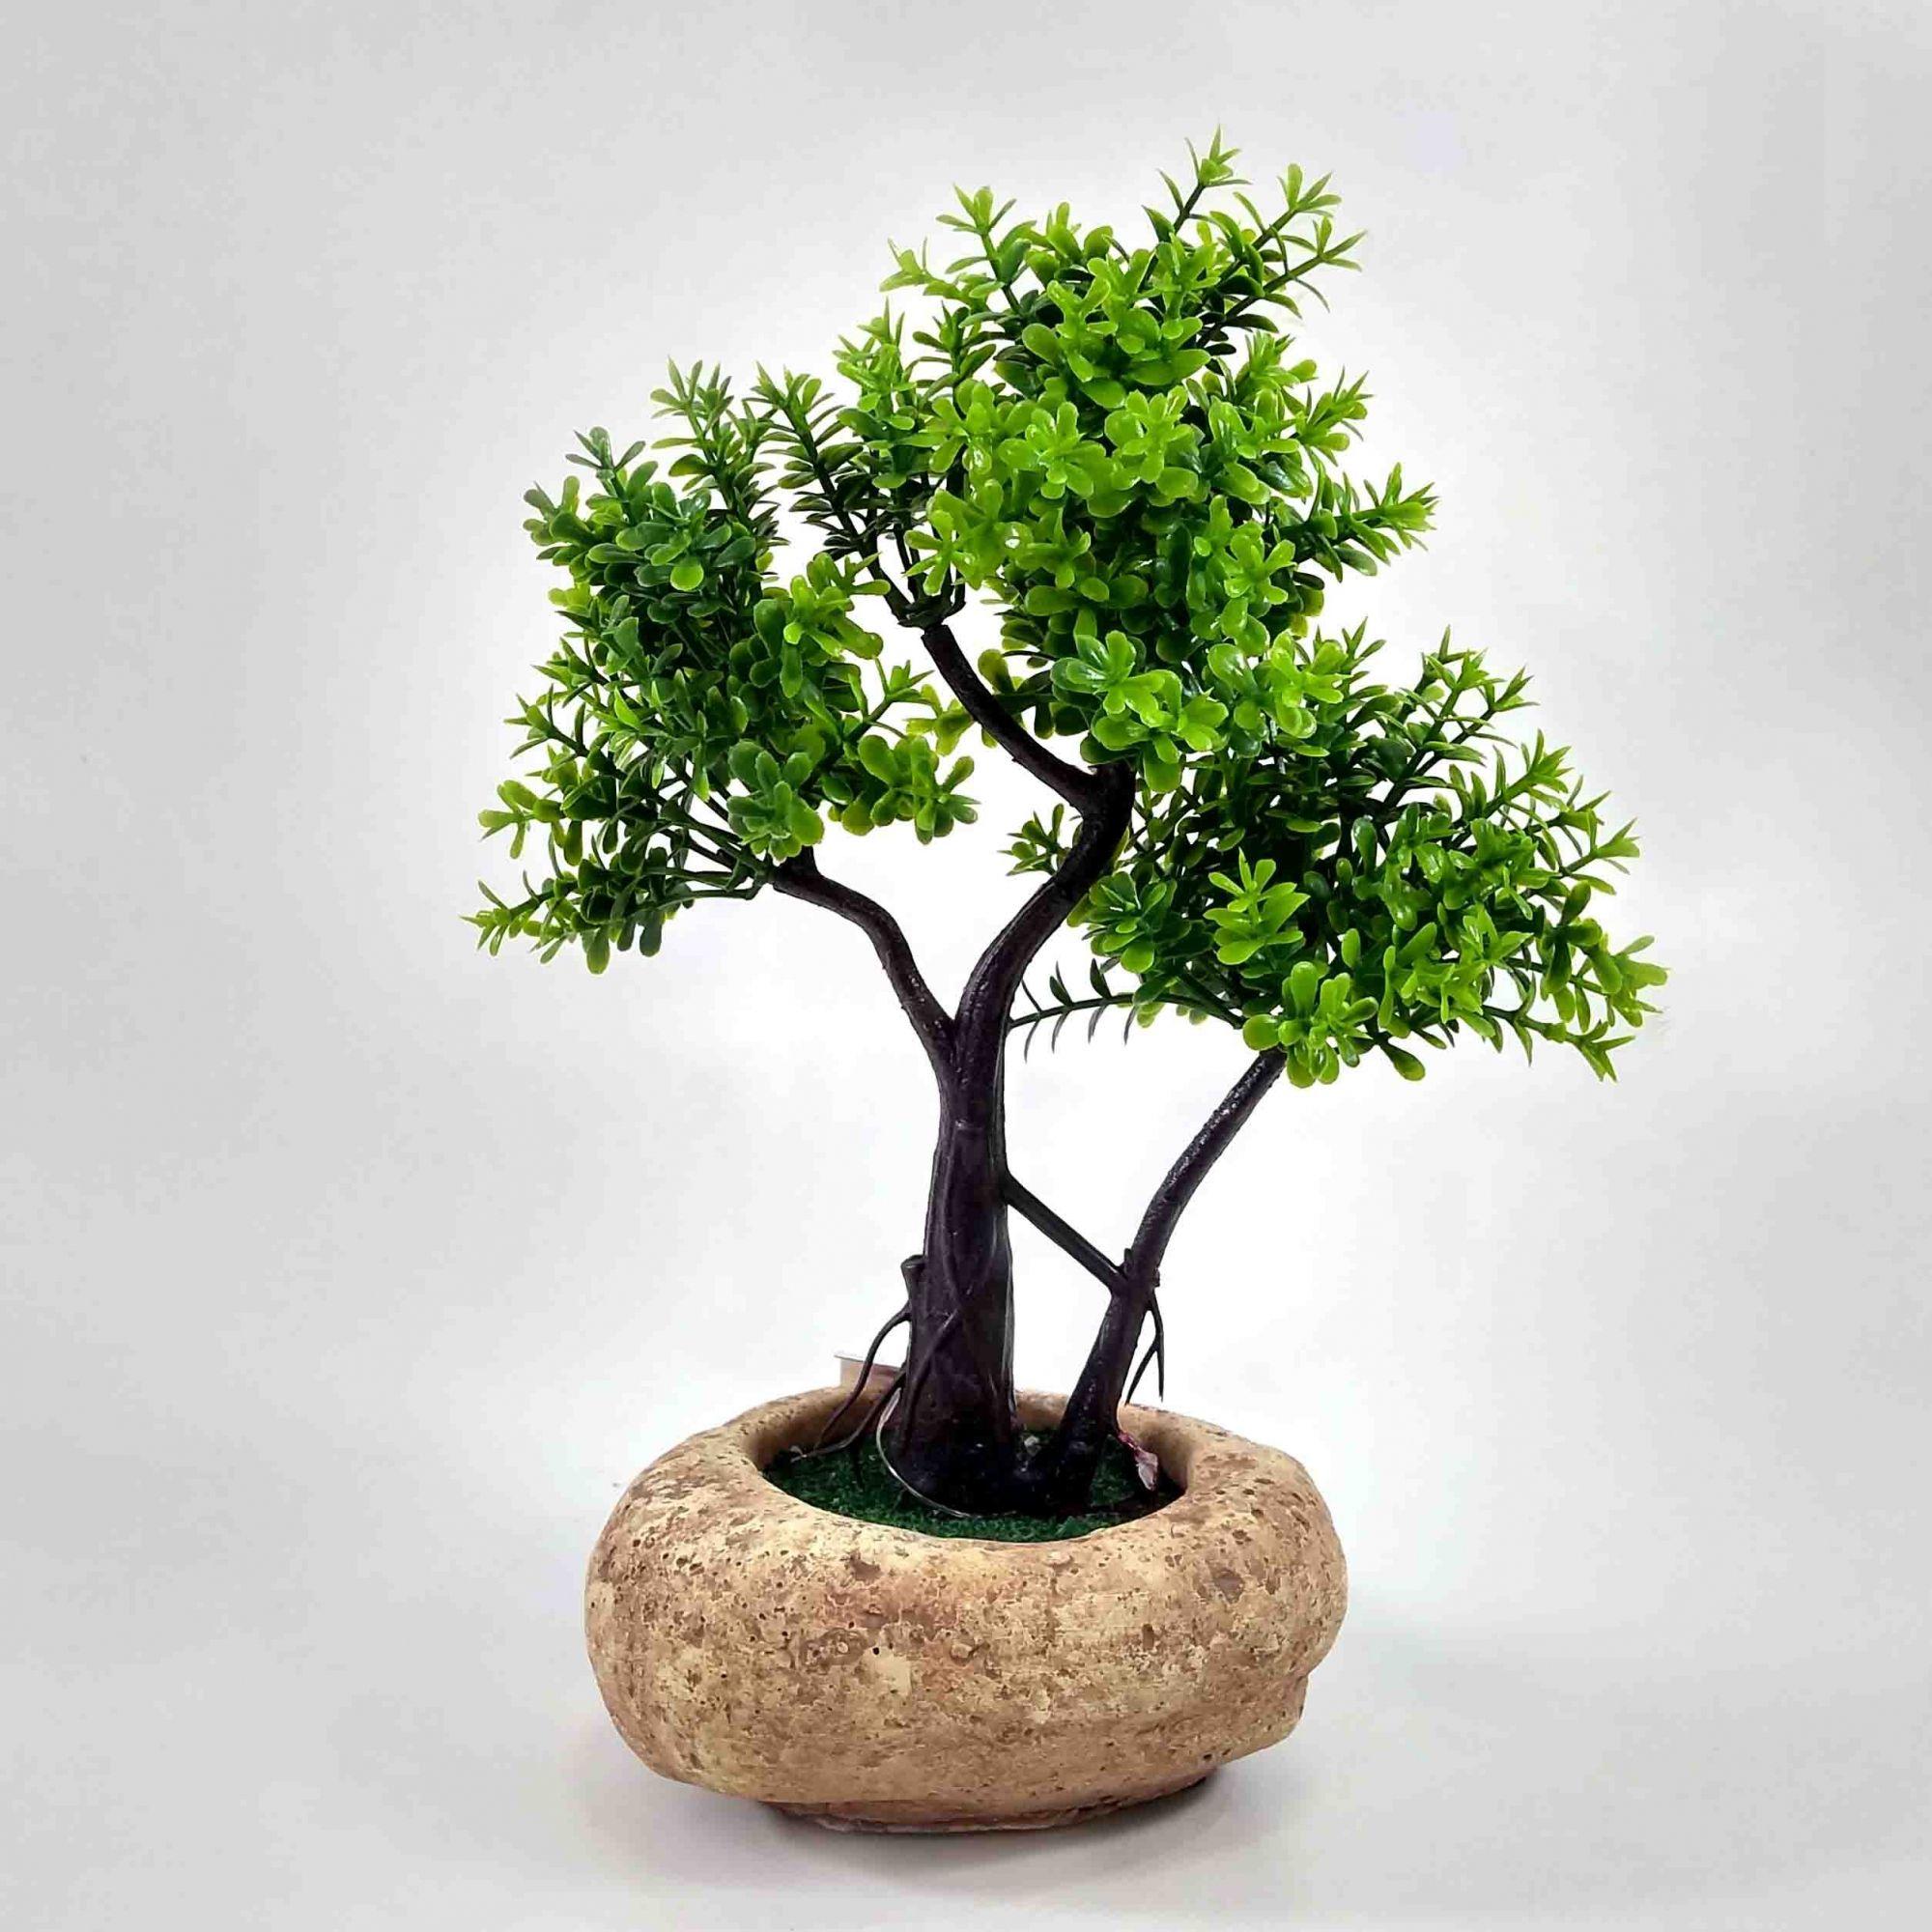 Flor Bonsai Verde C/ Vaso Cerâmica Artificial Permanente 20CM 36661-001